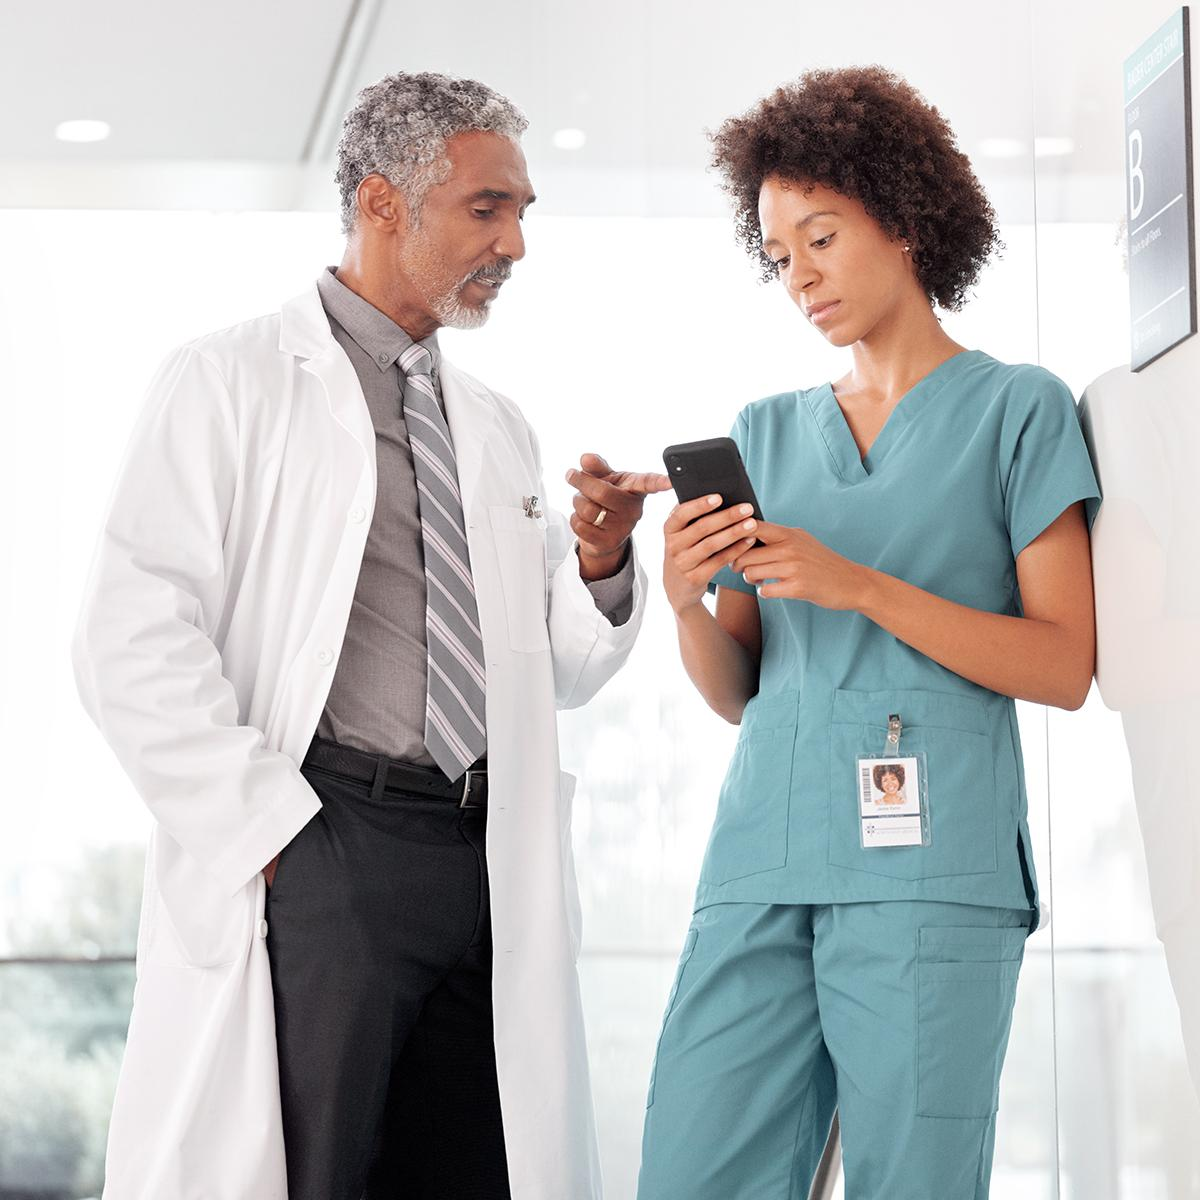 Nurse and clinician using a smartphone